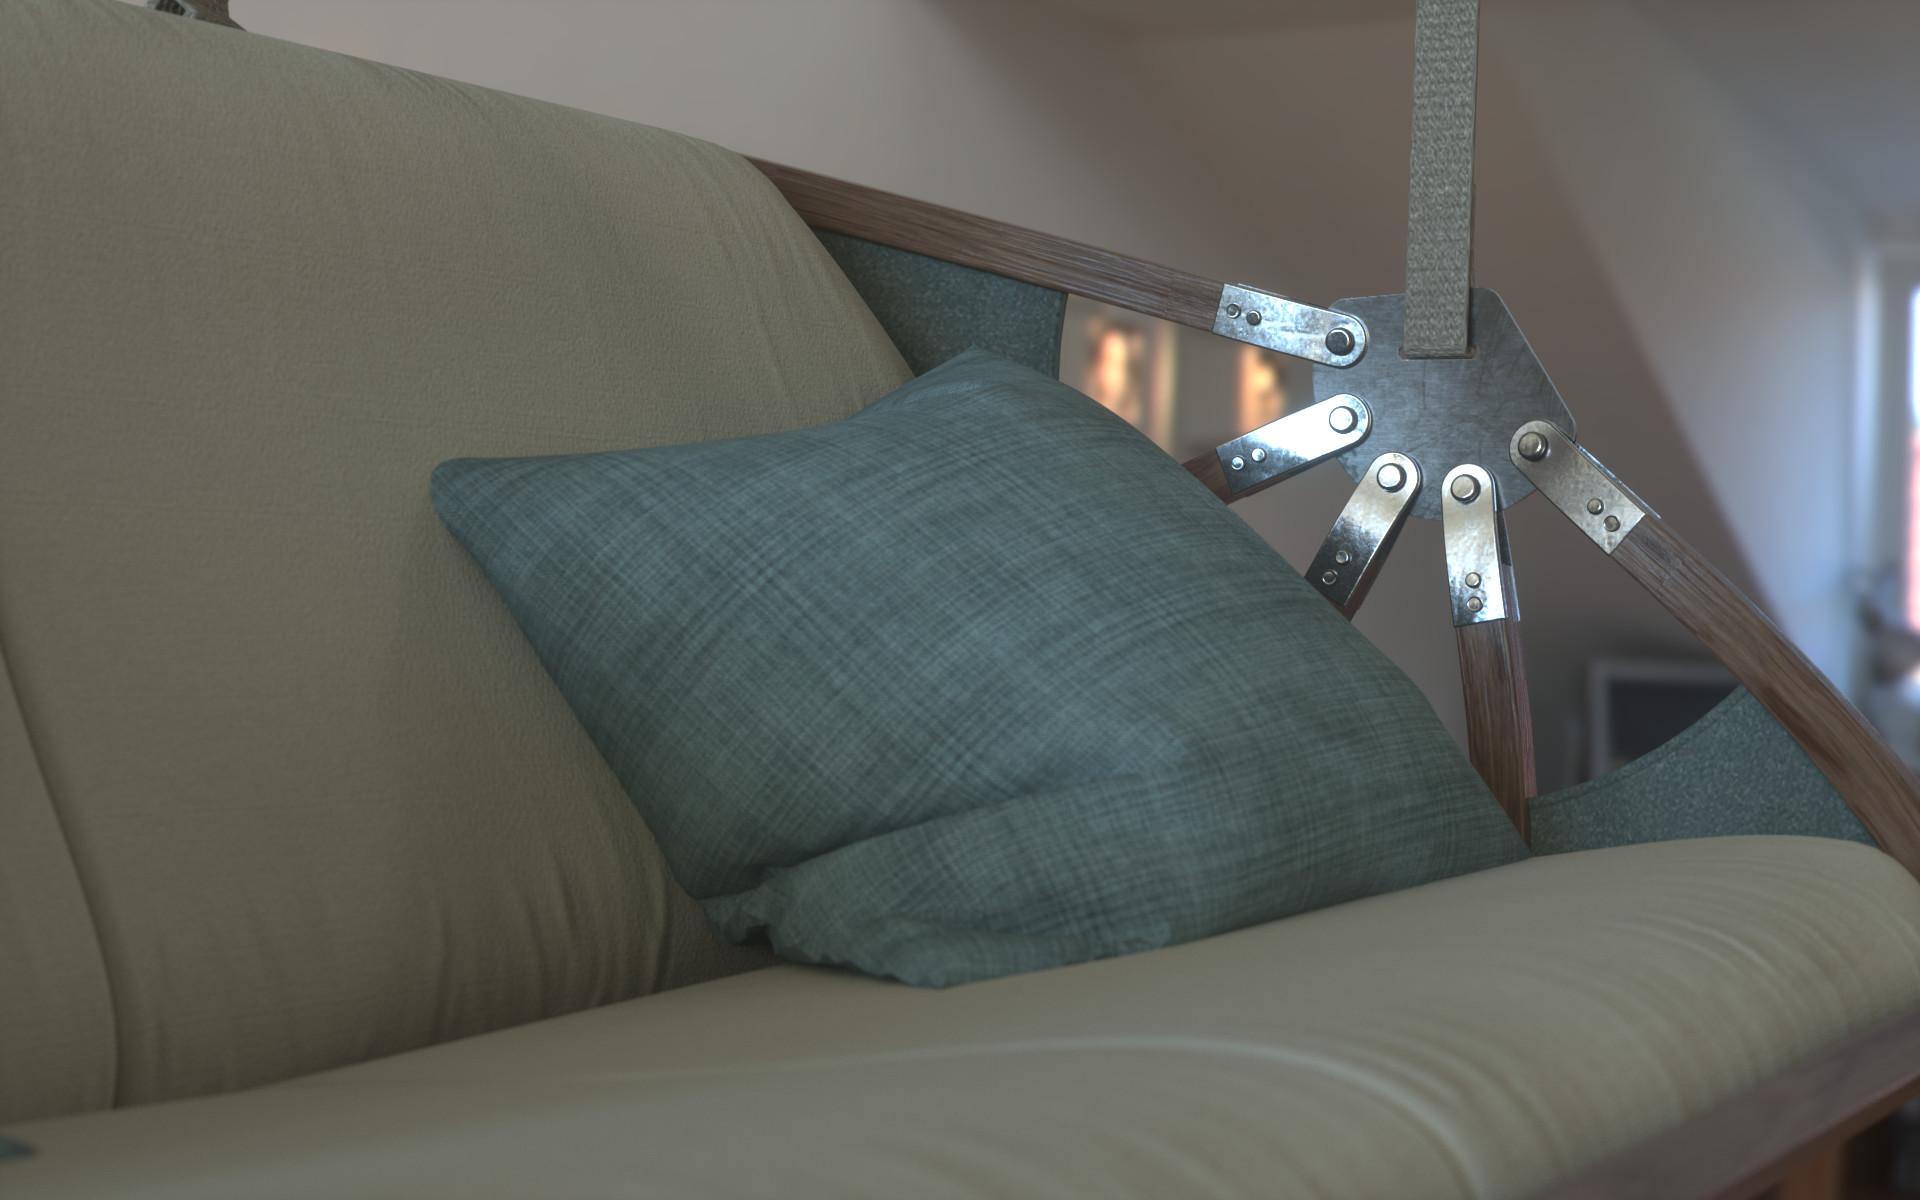 Cem tezcan swing boat sofa 00000